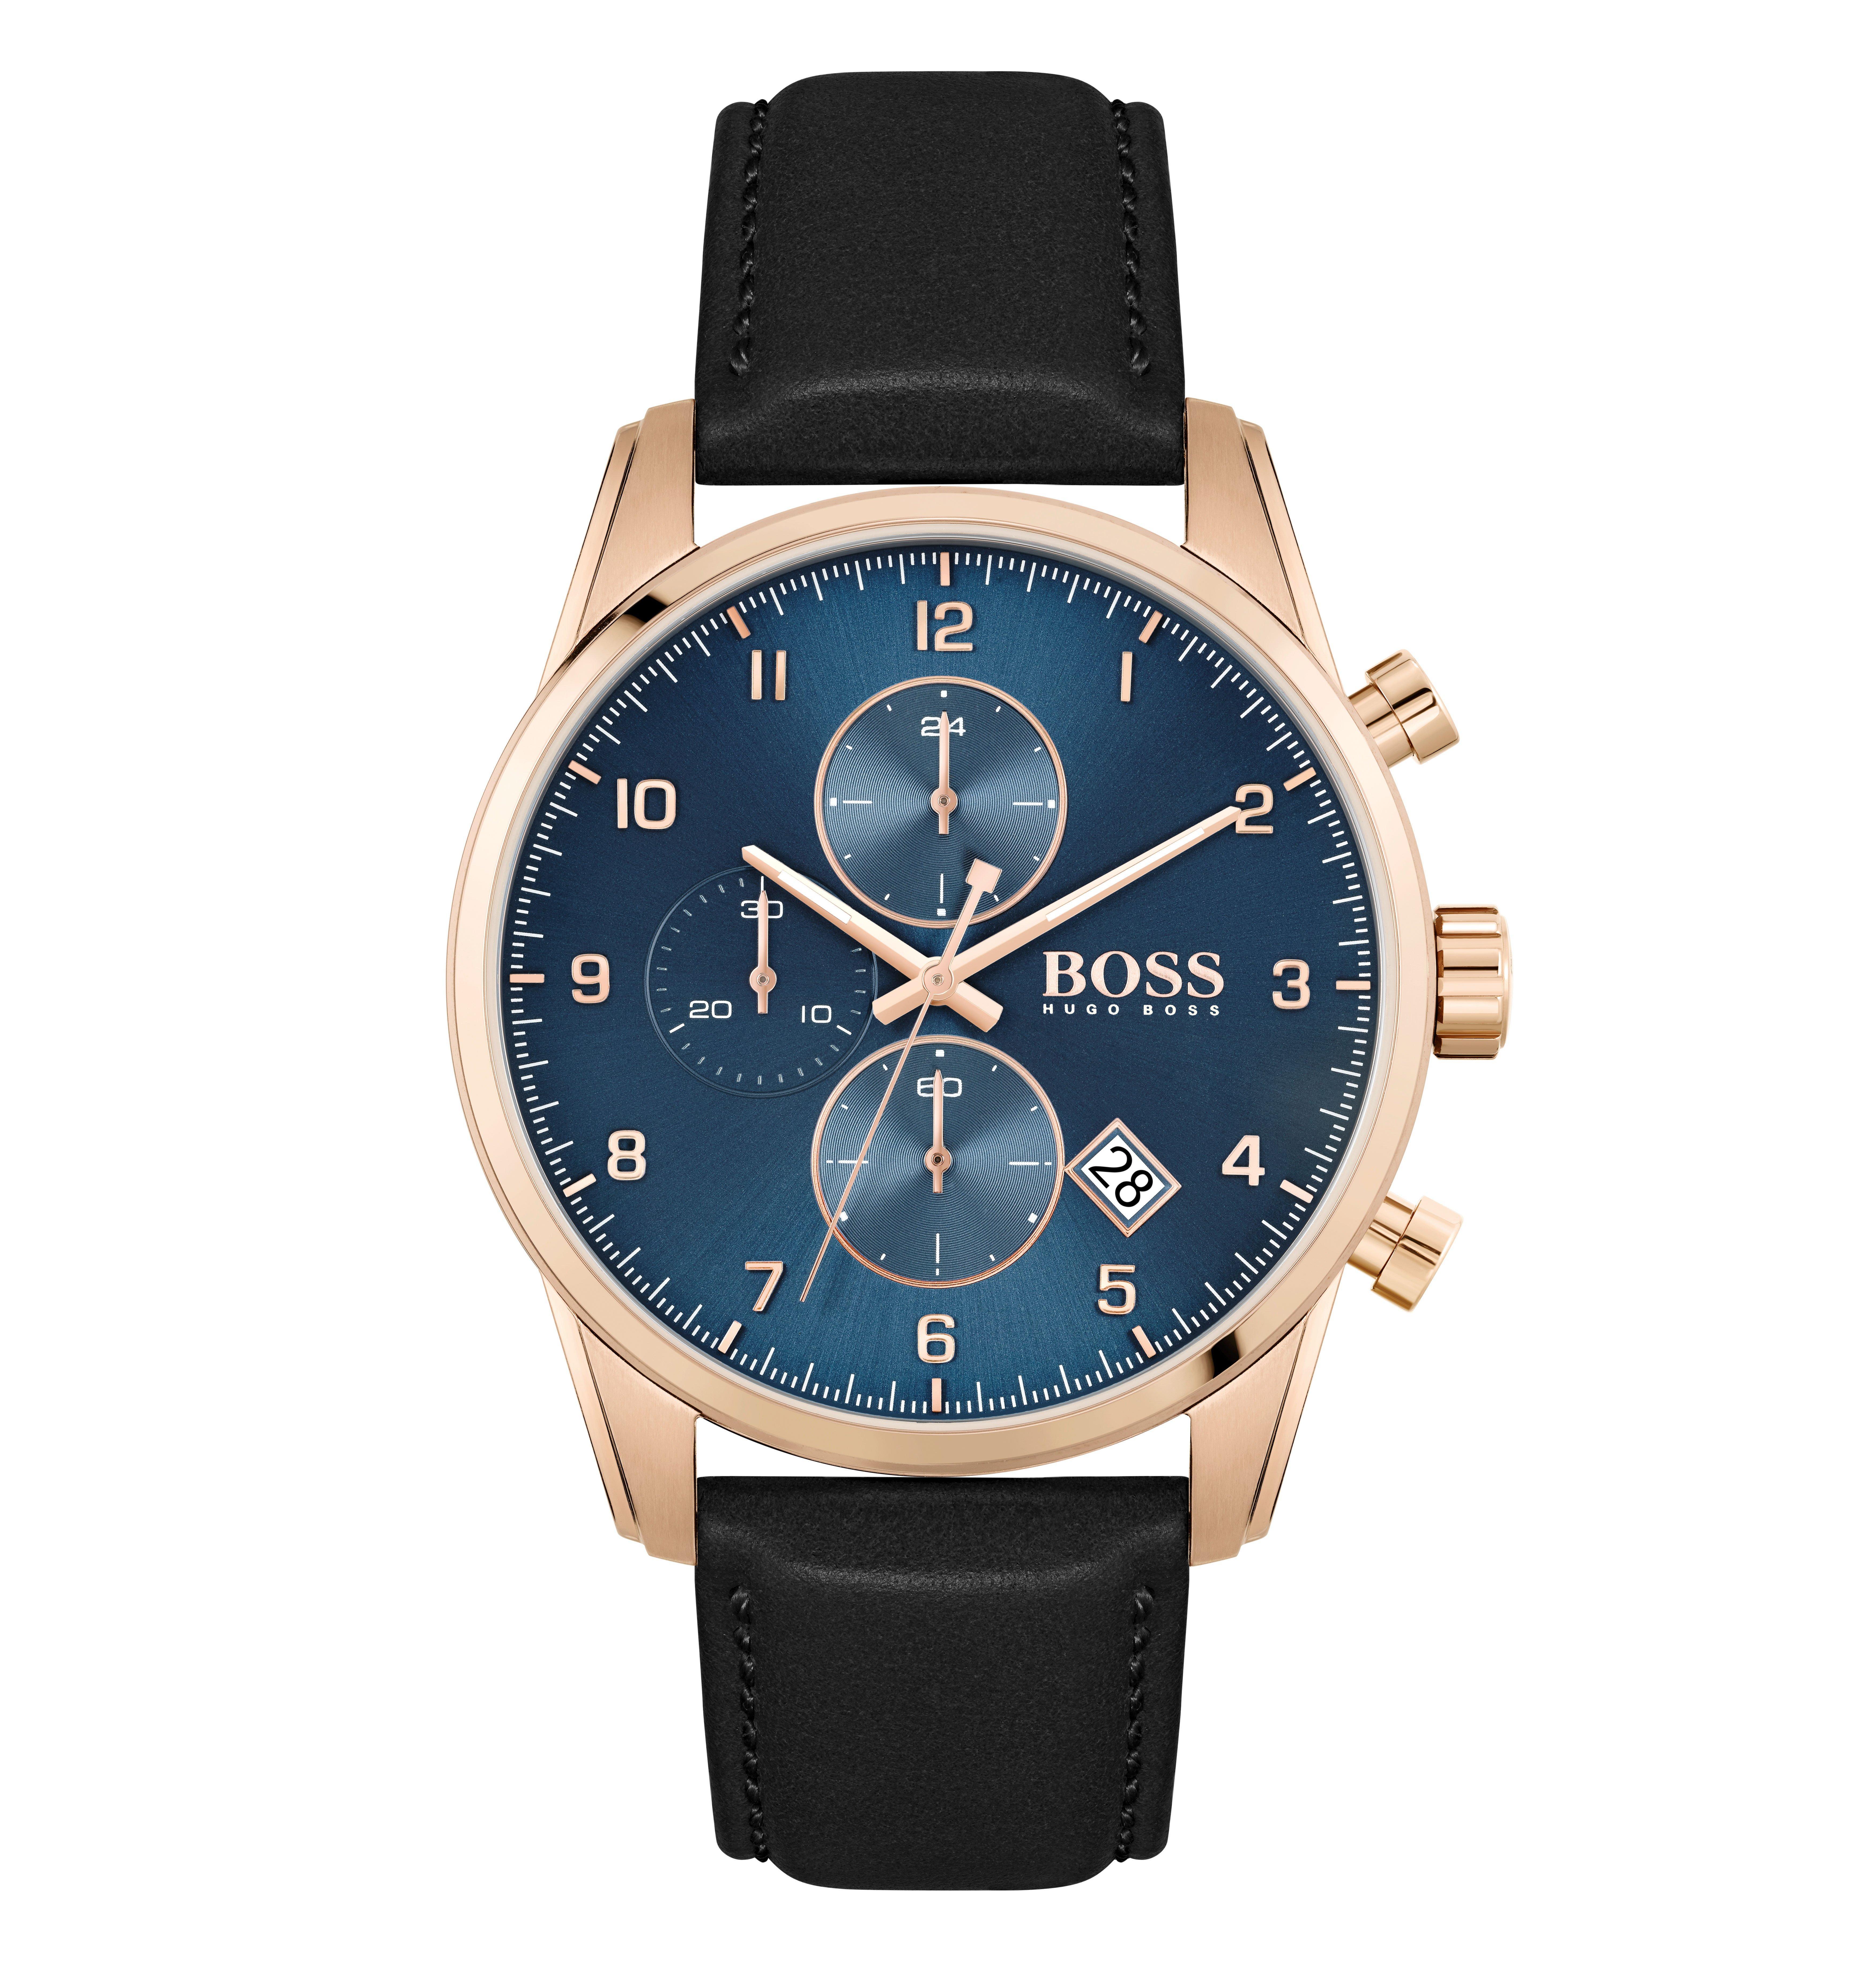 BOSS Skymaster Rose Gold Tone Chronograph Men's Watch